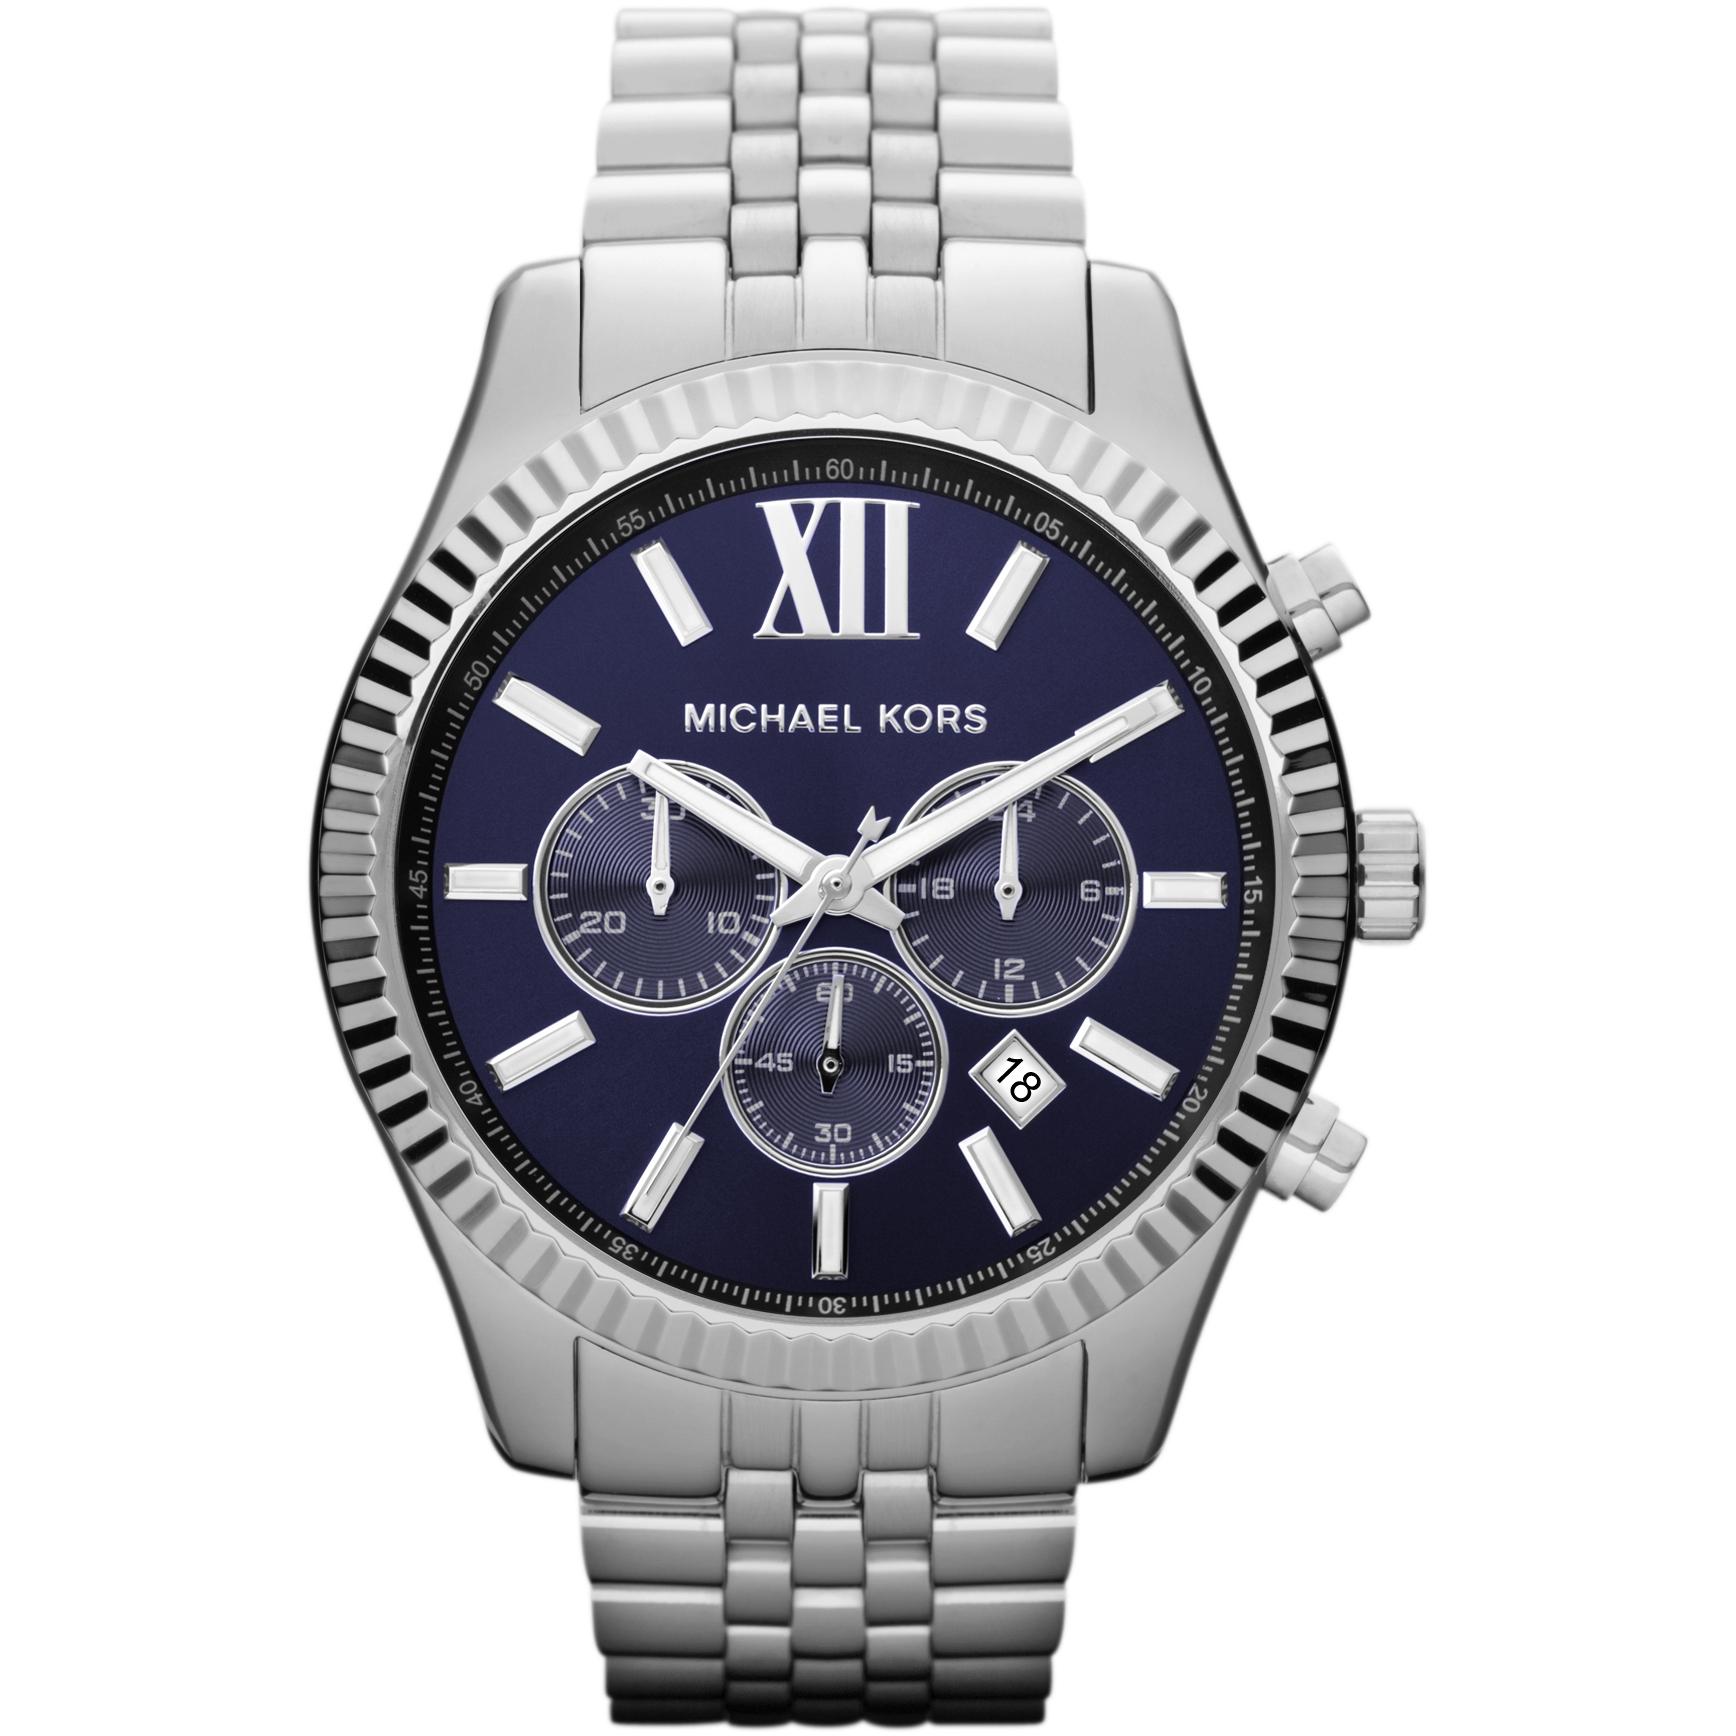 c723ebed8 Gents Michael Kors Lexington Chronograph Watch (MK8280) | WatchShop.com™